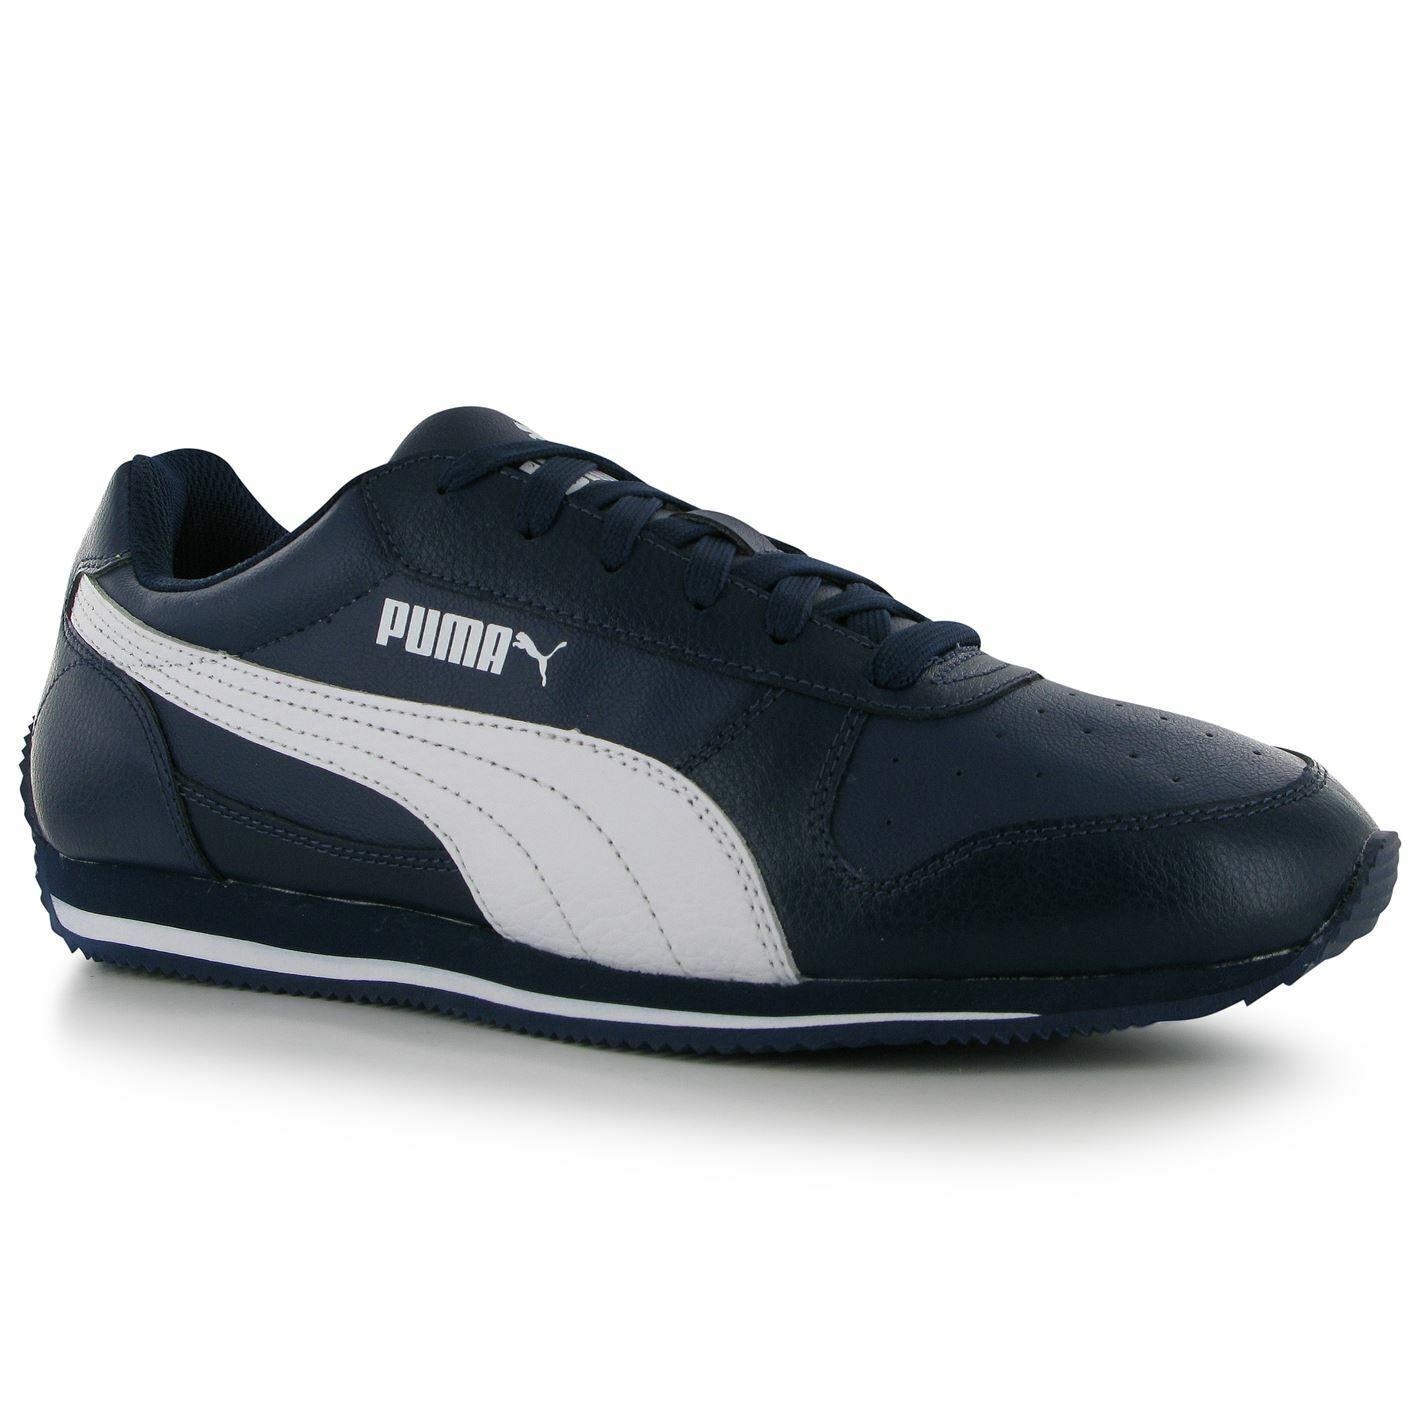 Puma Fieldsprint LNM Mens shoes Trainers Peacoat  White Sneakers Sports Footwear